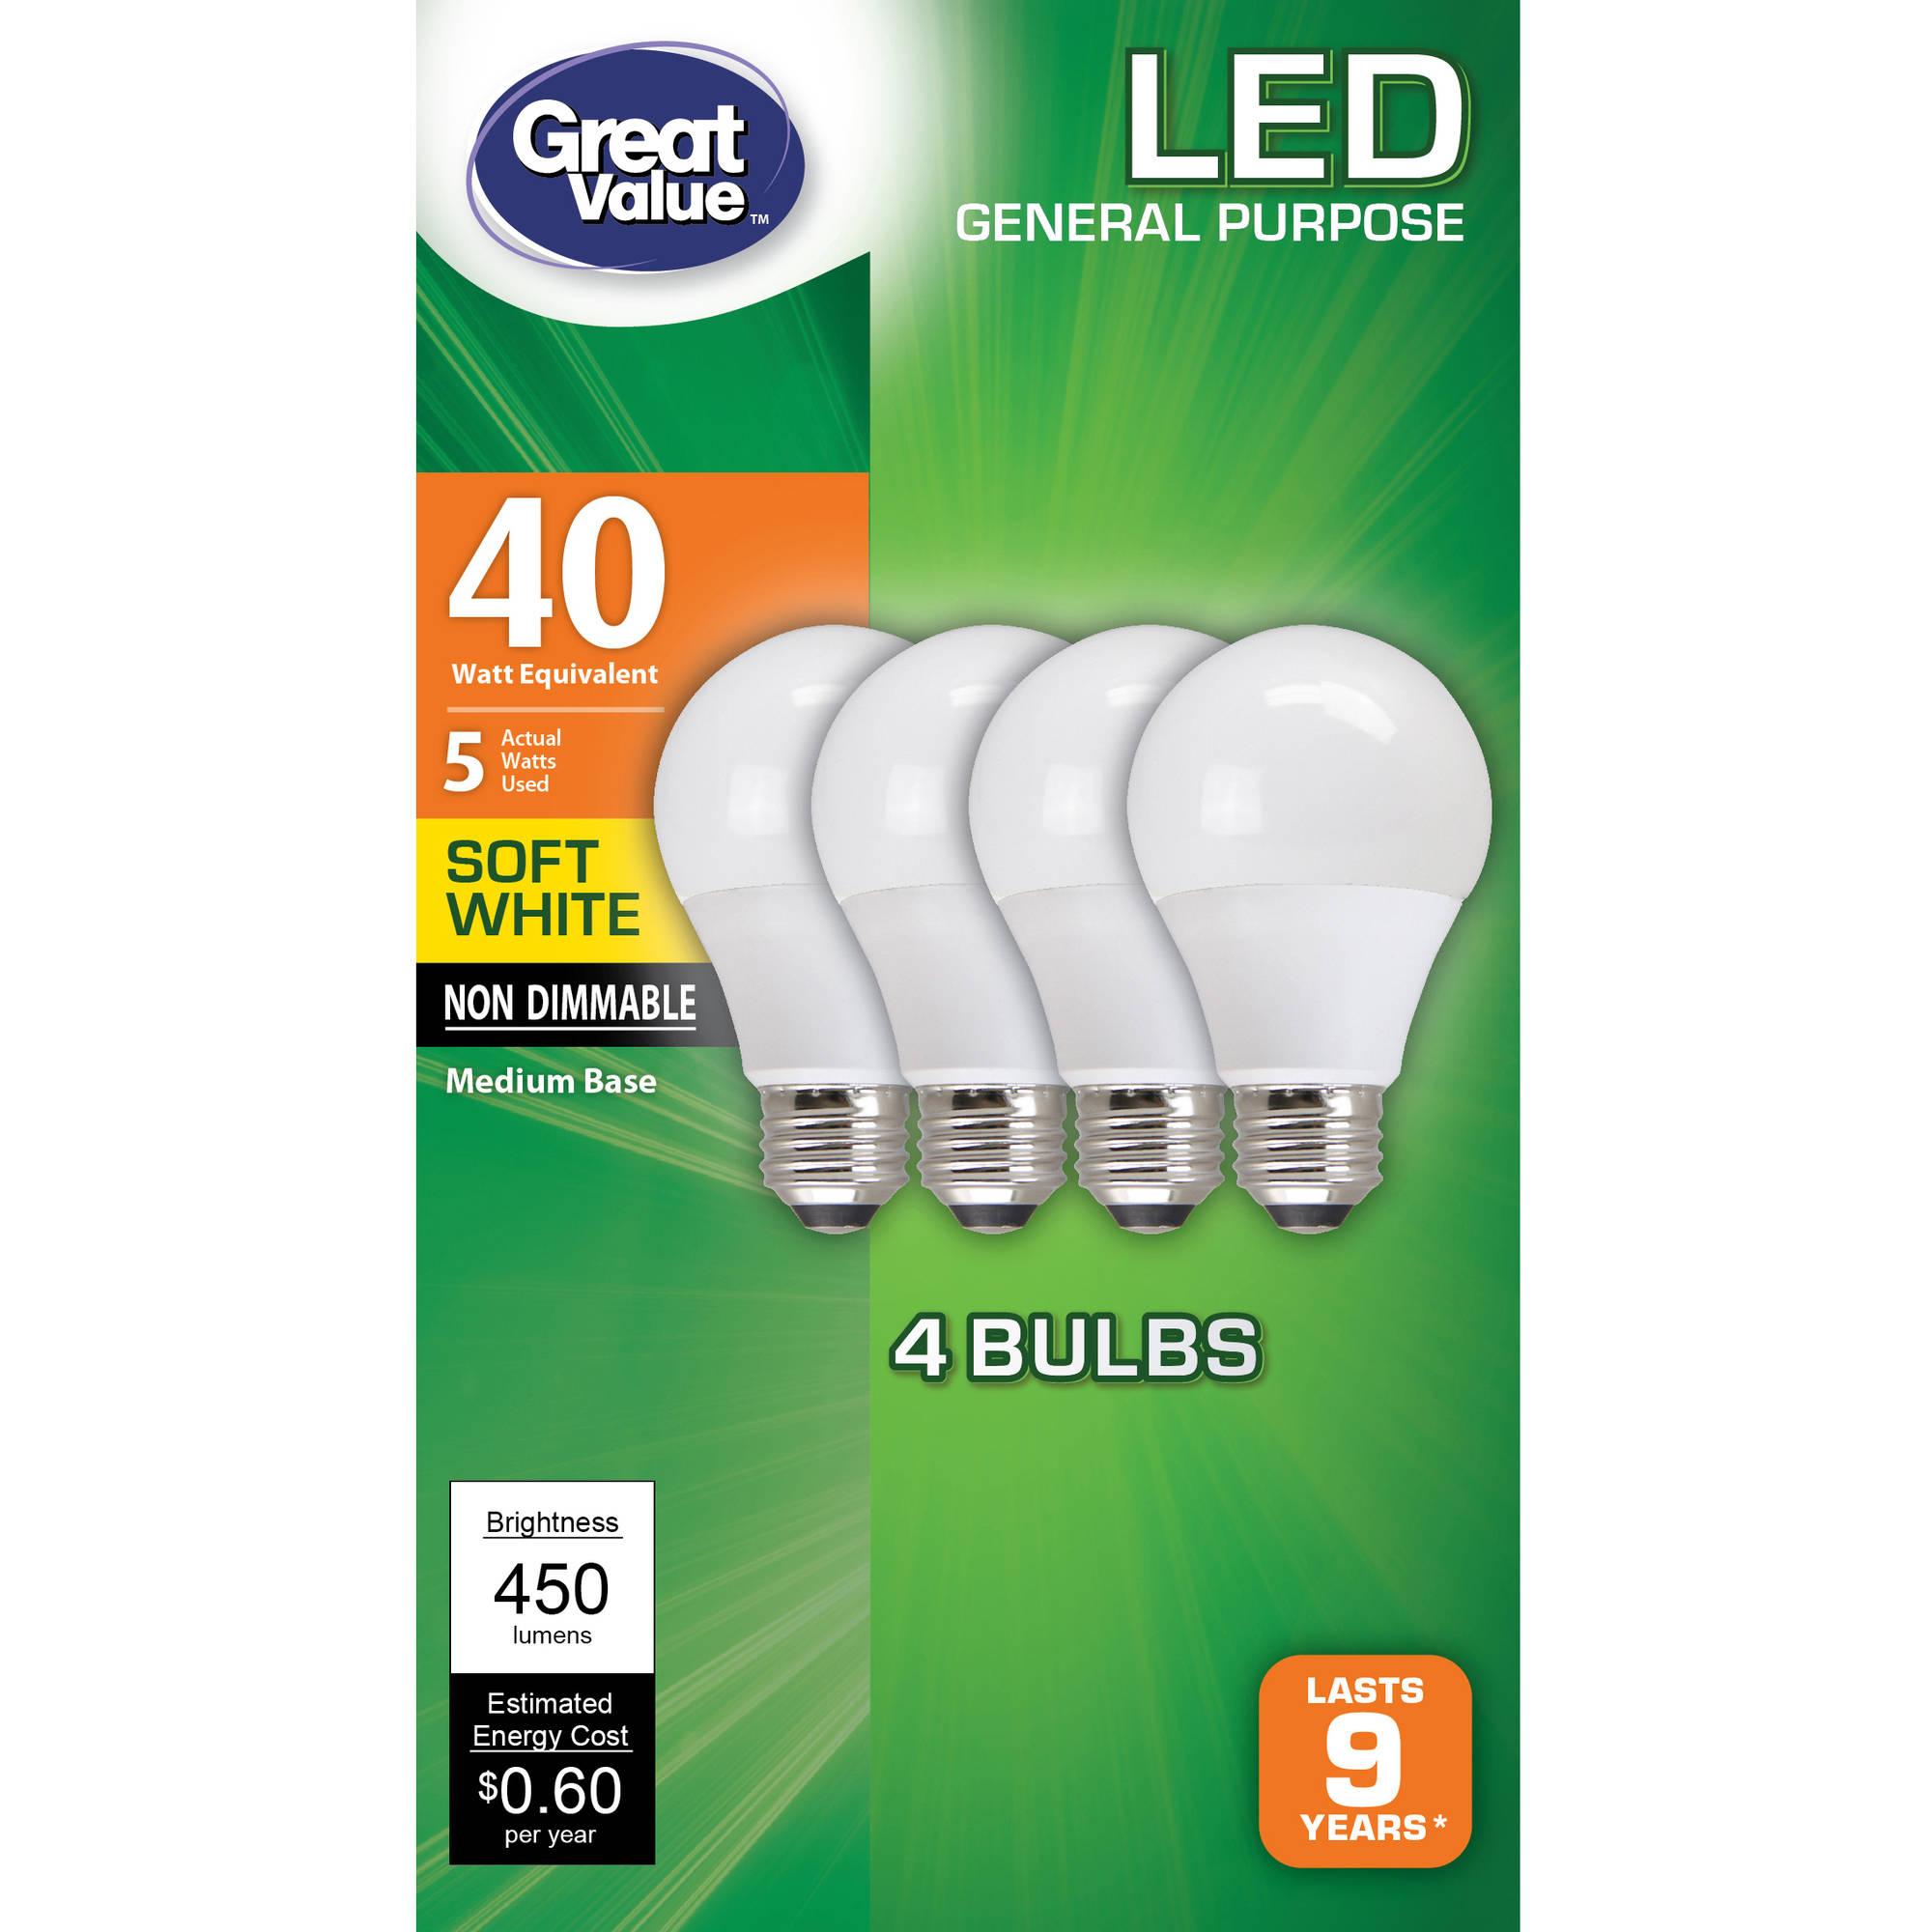 2-Pack 241555401 Refrigerator Light Bulb Replacement for Frigidaire FFTR1821QS5A Refrigerator Compatible with Frigidaire 241555401 Light Bulb